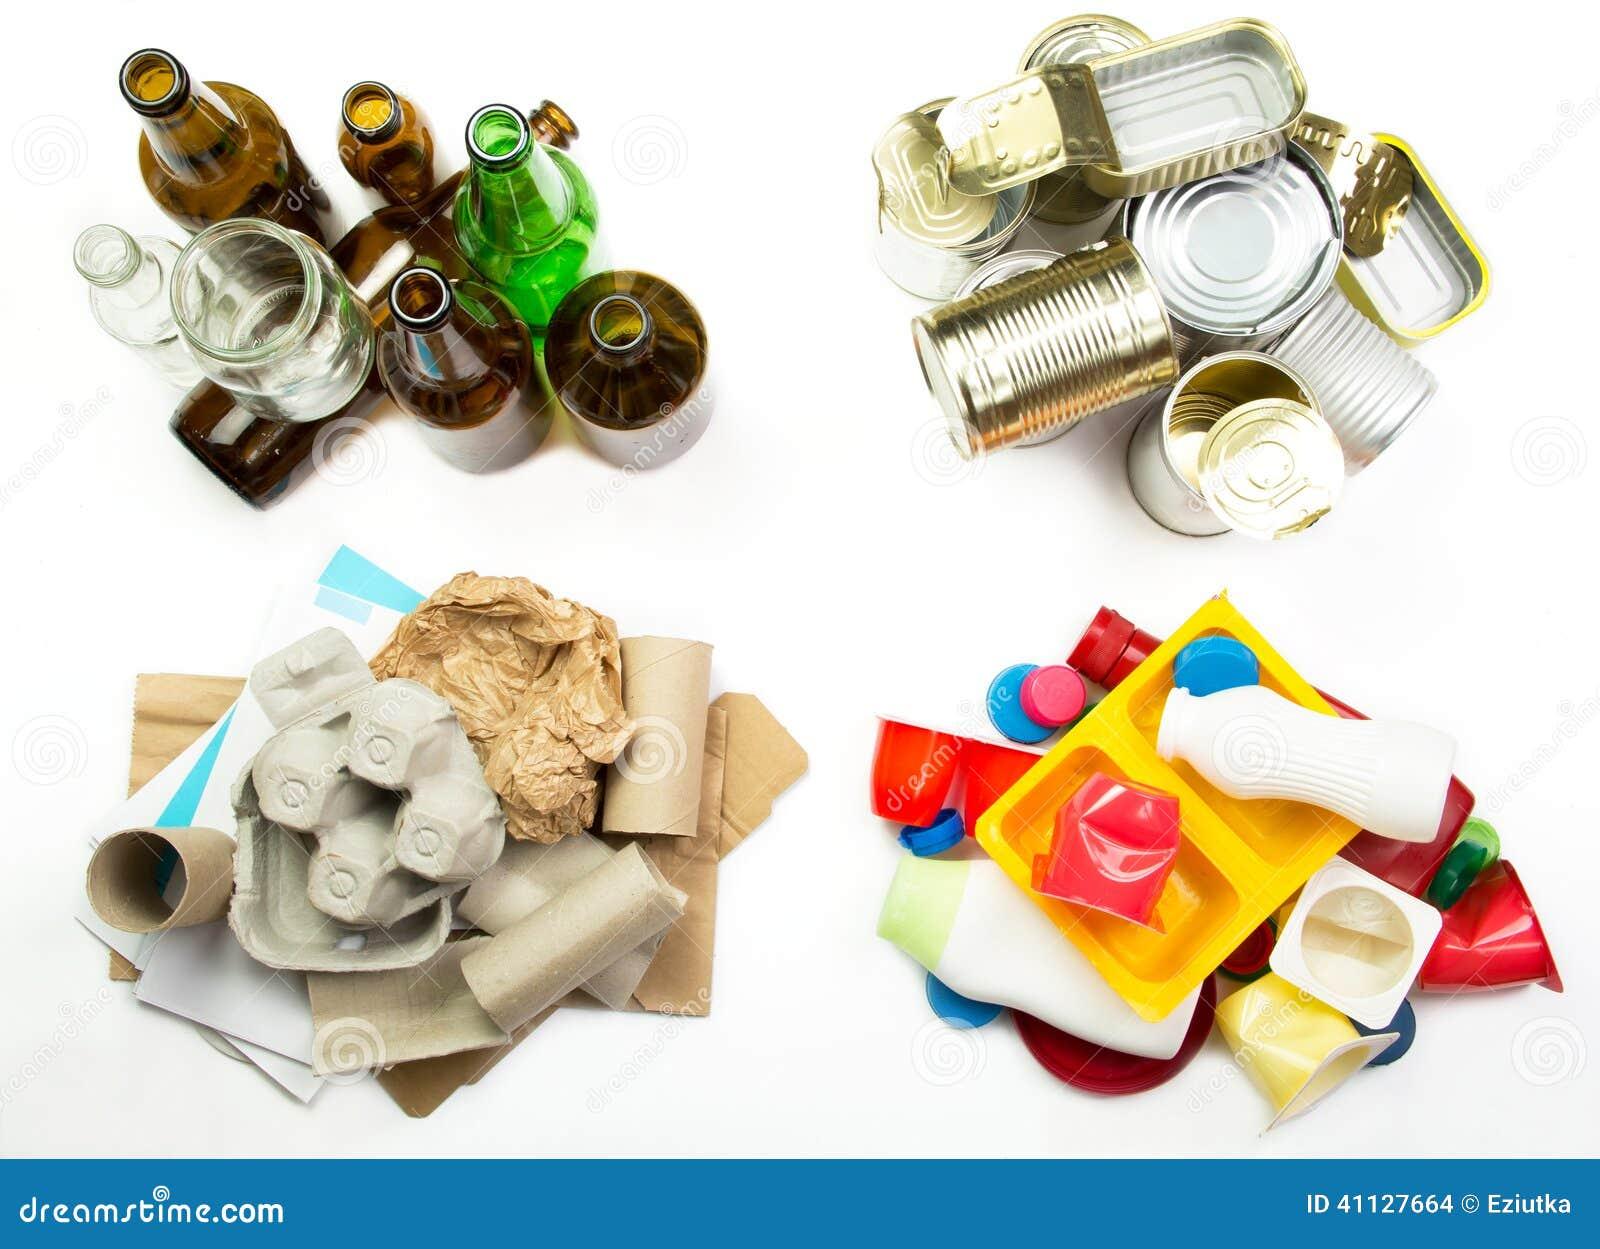 Basura segregada aliste para reciclar vidrio metal - Papel para vidrios ...